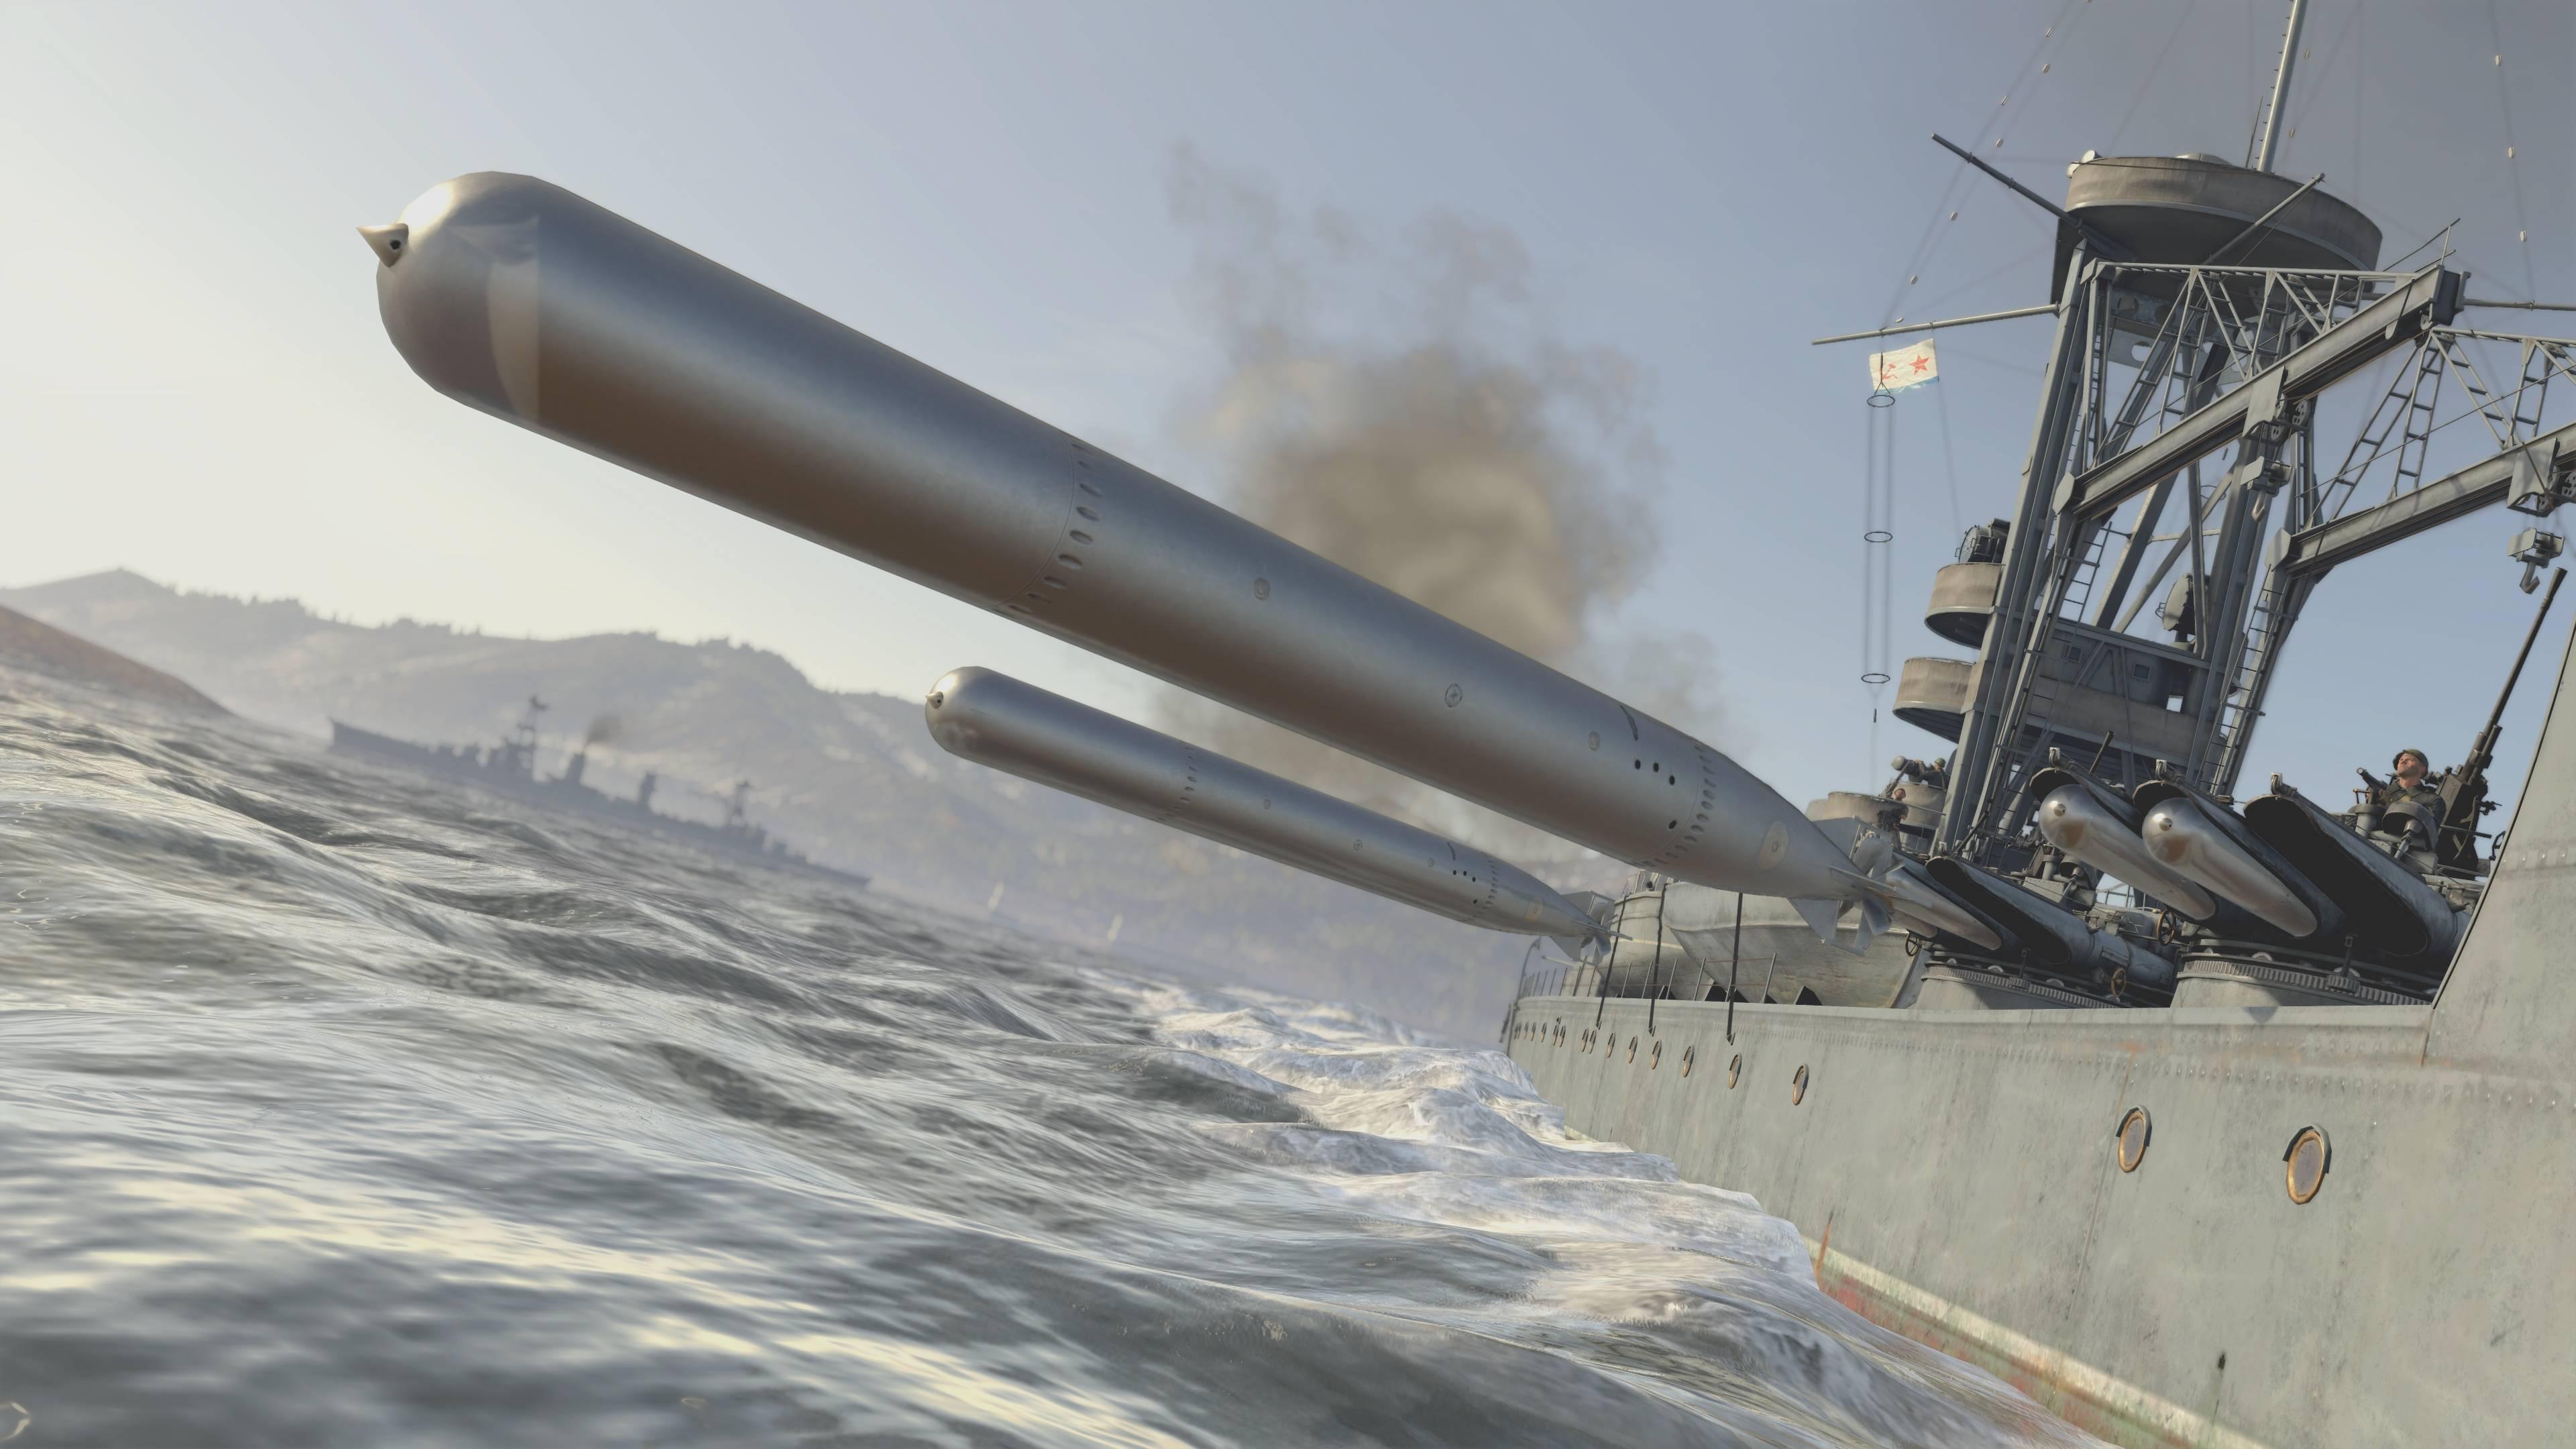 533-мм торпеда g7a